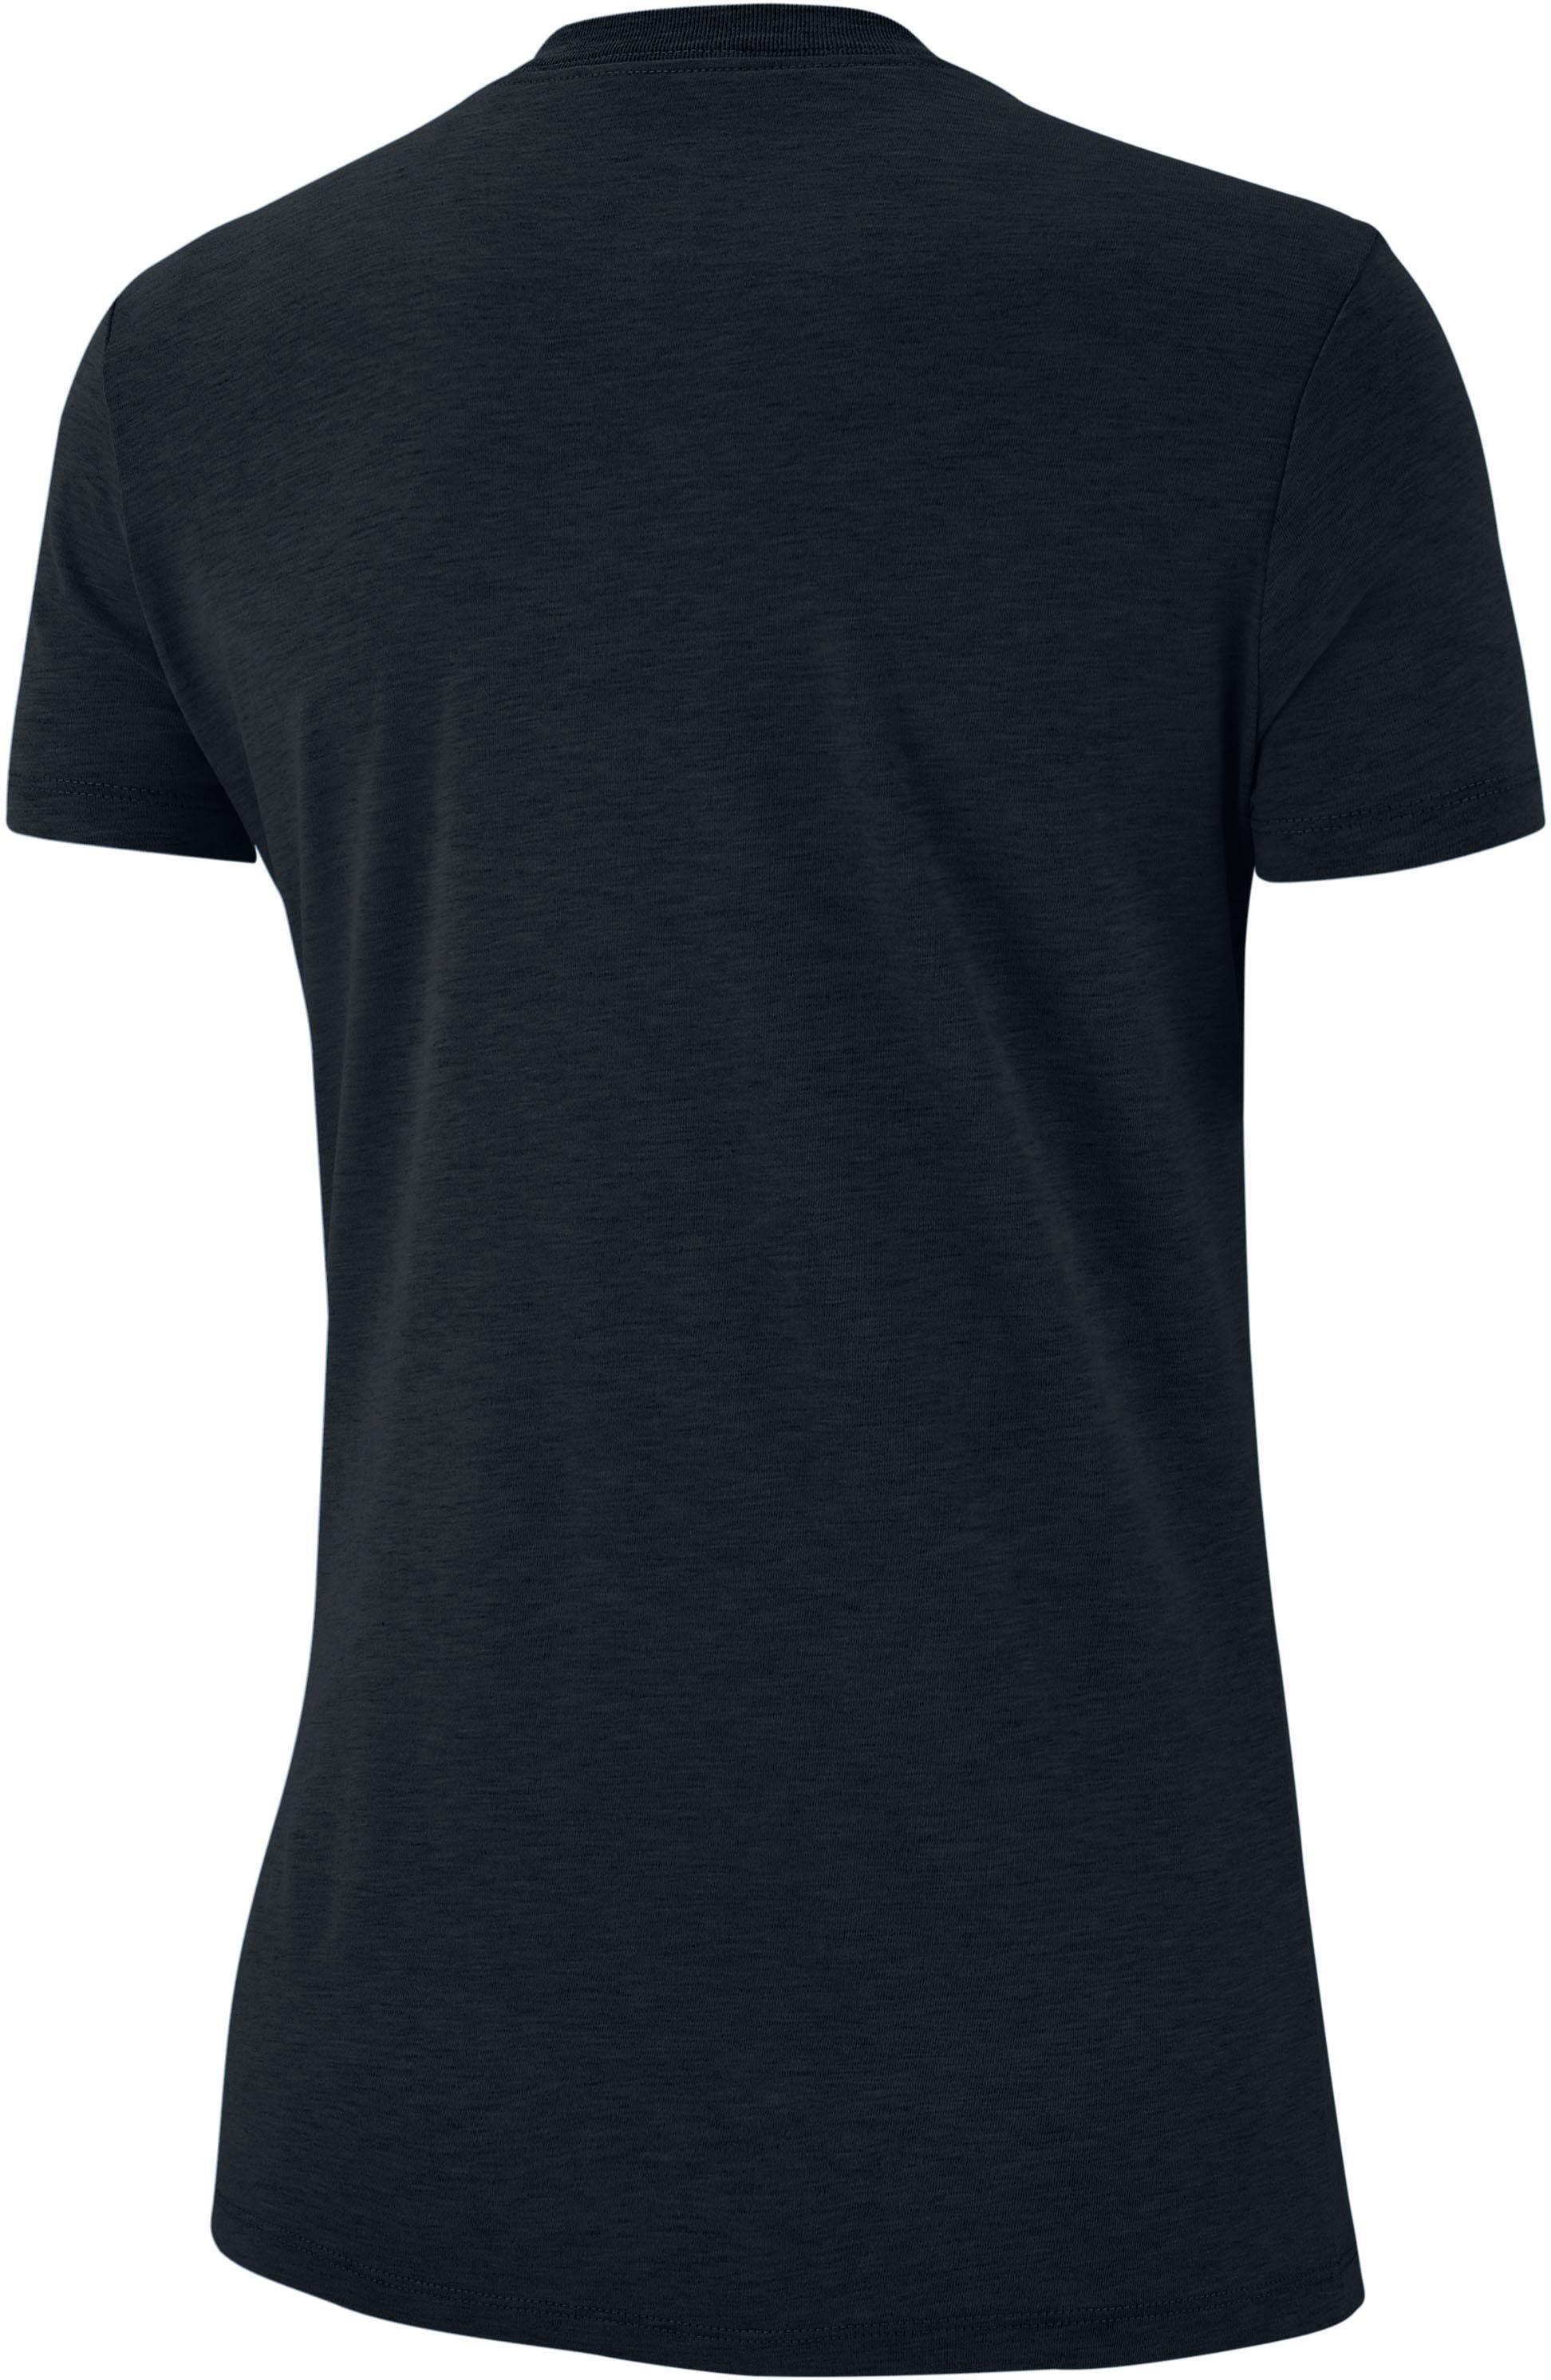 nike trainingsshirt nike drifit womens training tshirt Trainingsshirt von NIKE